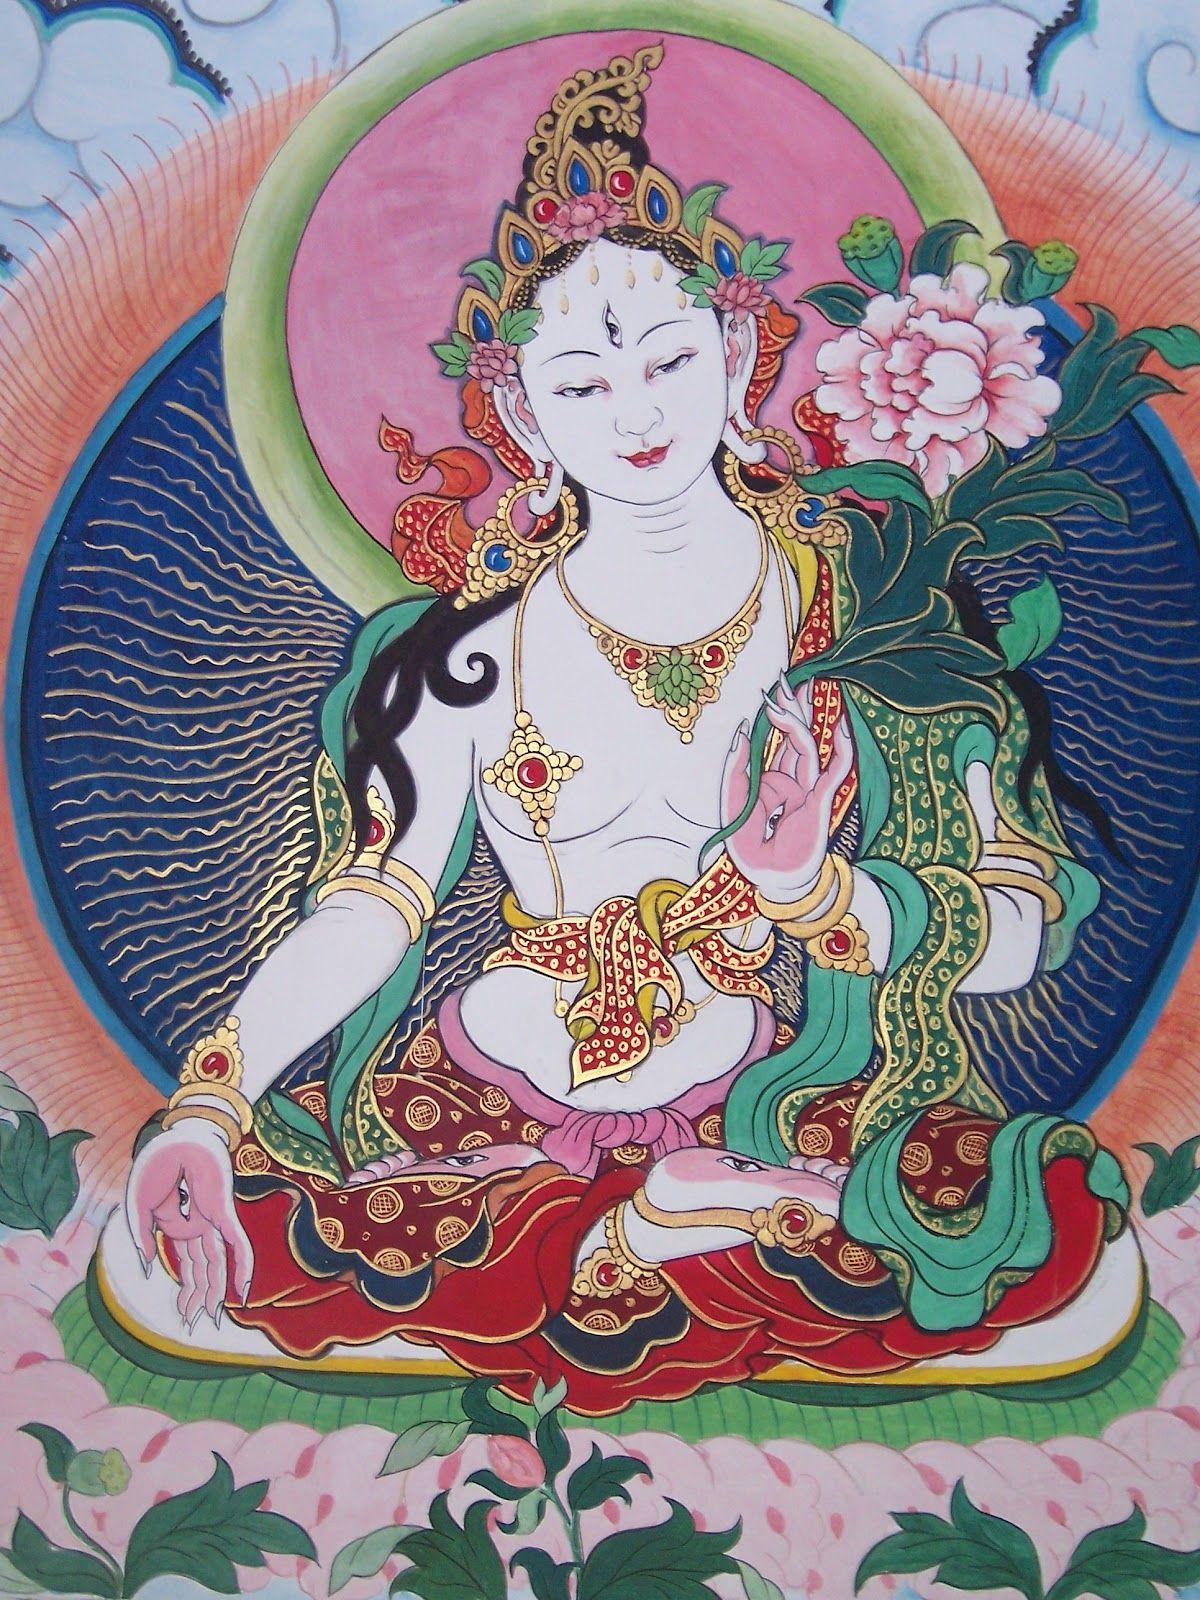 White Tara | Тибетское искусство, Буддийское искусство, Будда